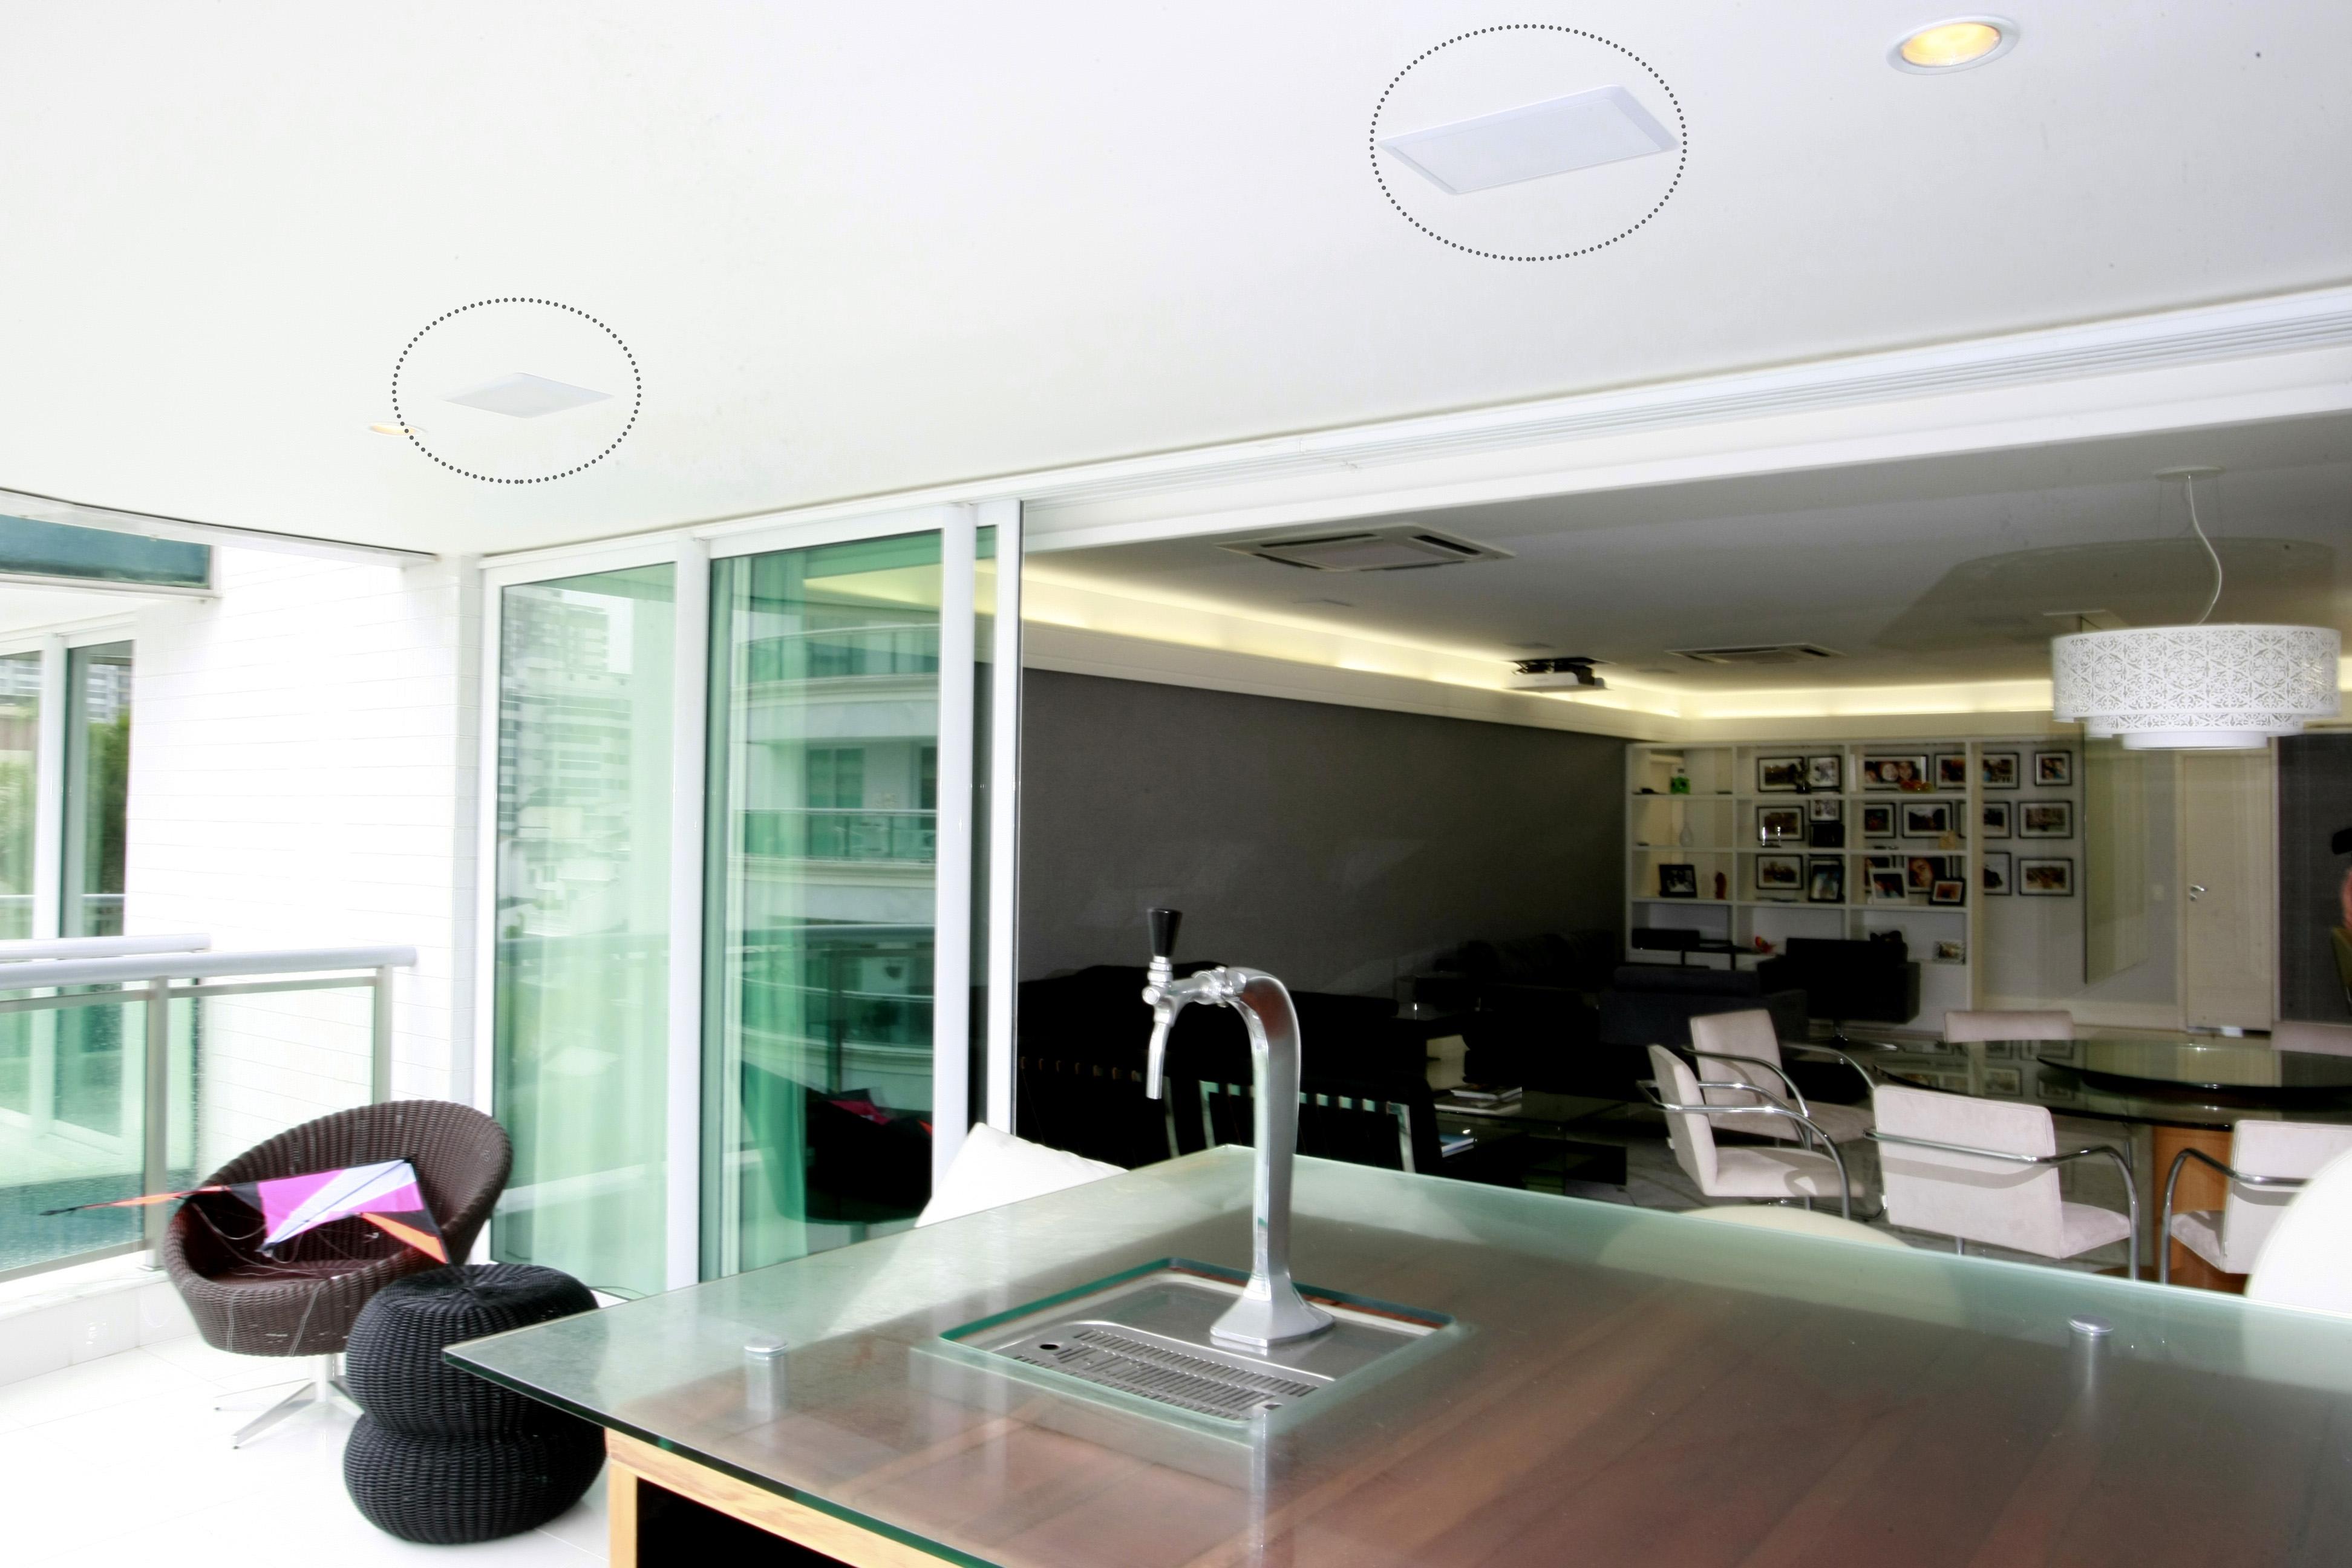 os dois lados do lazer imagem digital home. Black Bedroom Furniture Sets. Home Design Ideas